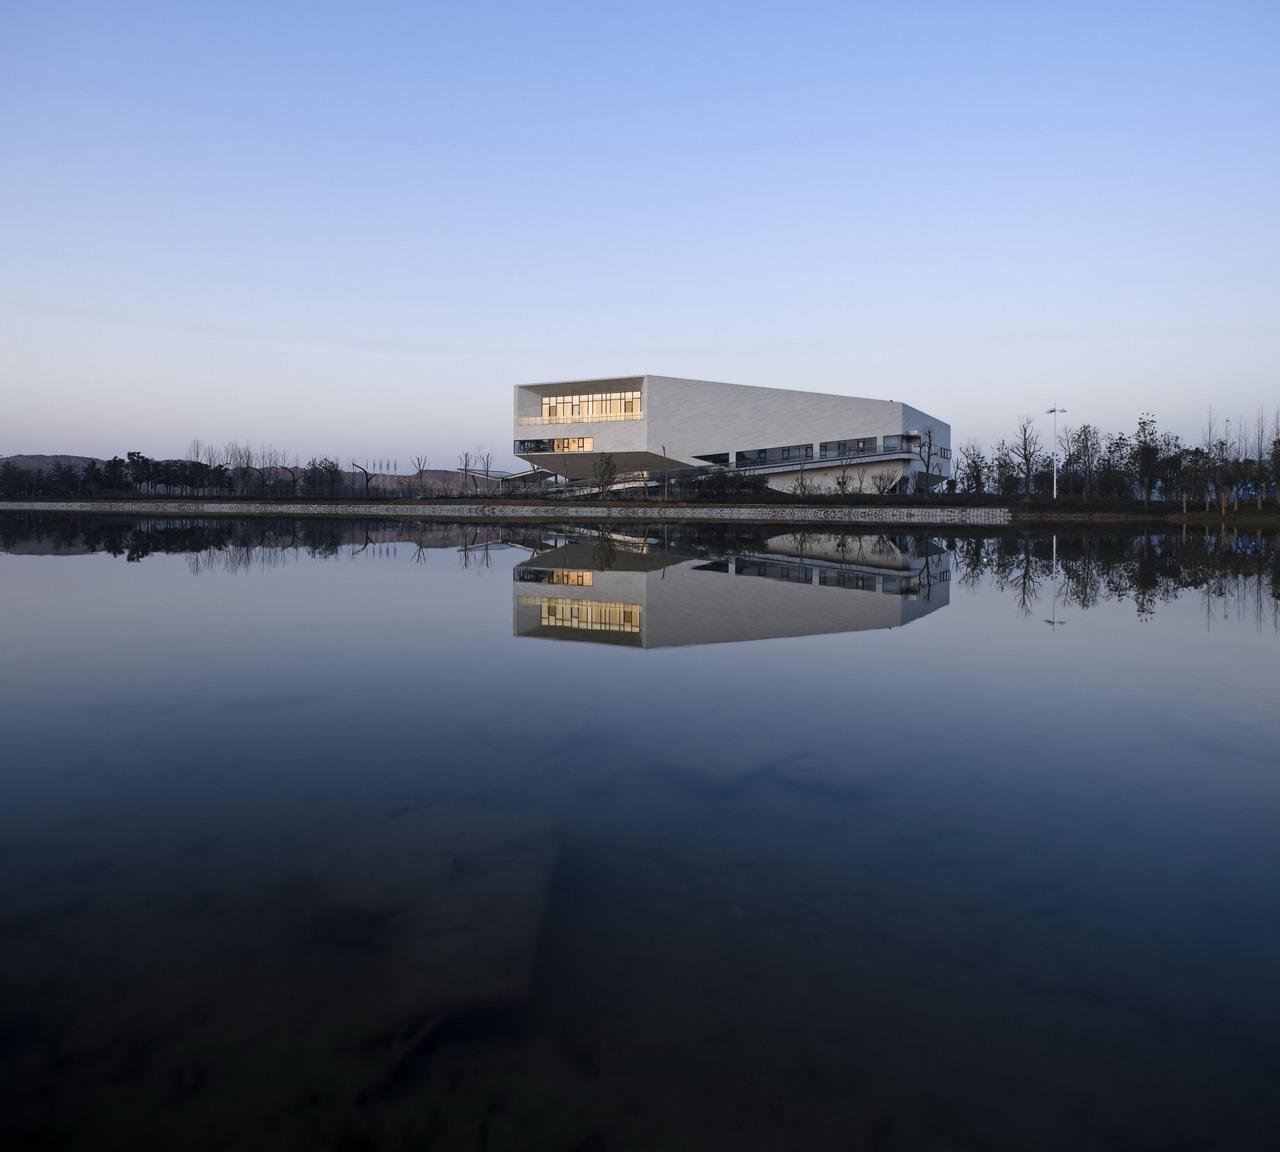 Centro de Recepção Bio-Lake / Zephyr Architects, © Yao Li